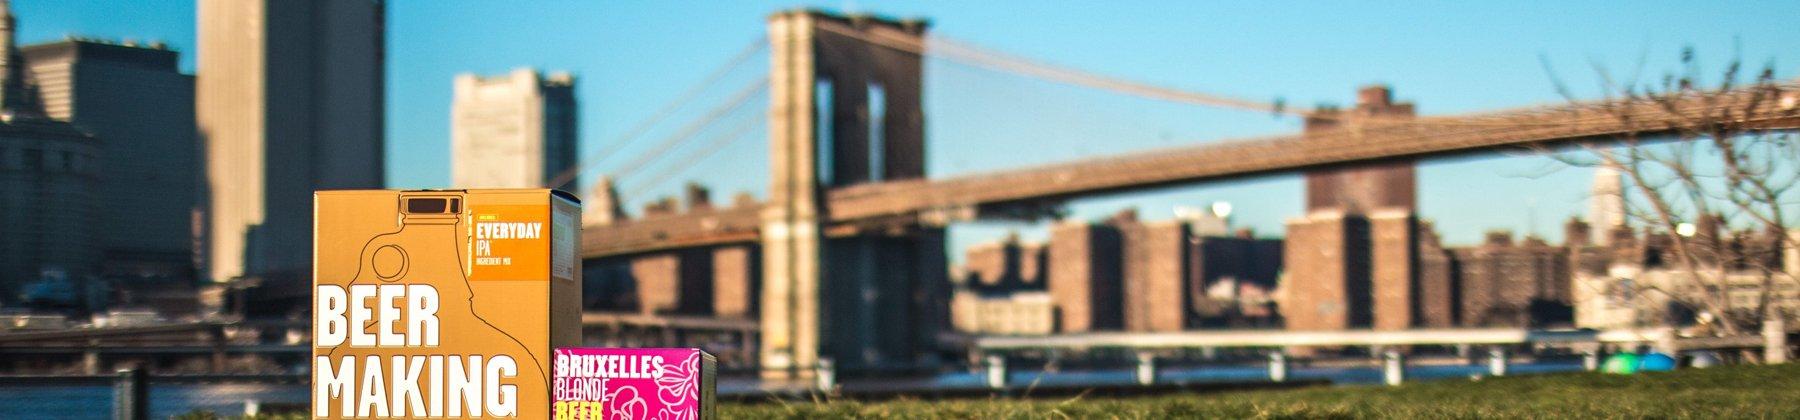 Photo of Brooklyn Bridge and Brooklyn Brew Shop box.